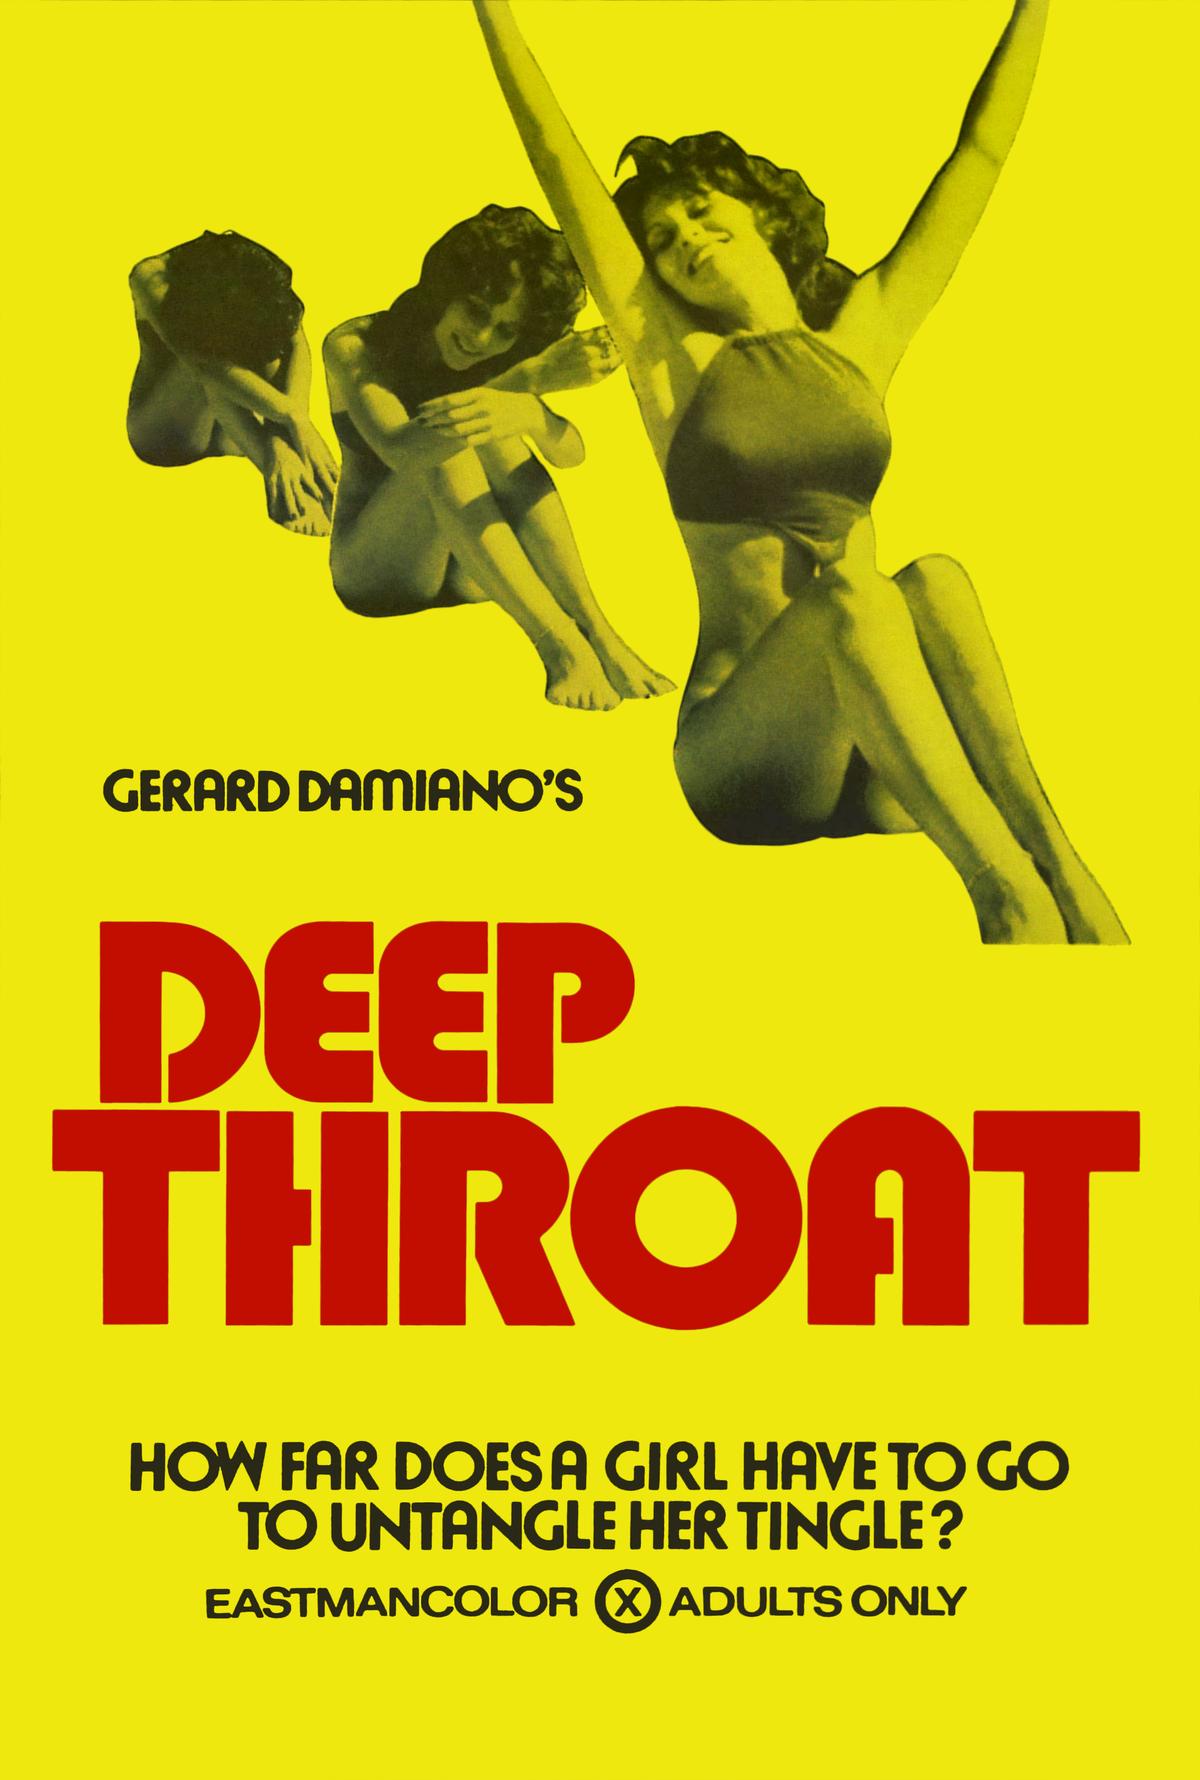 Deep throat vid